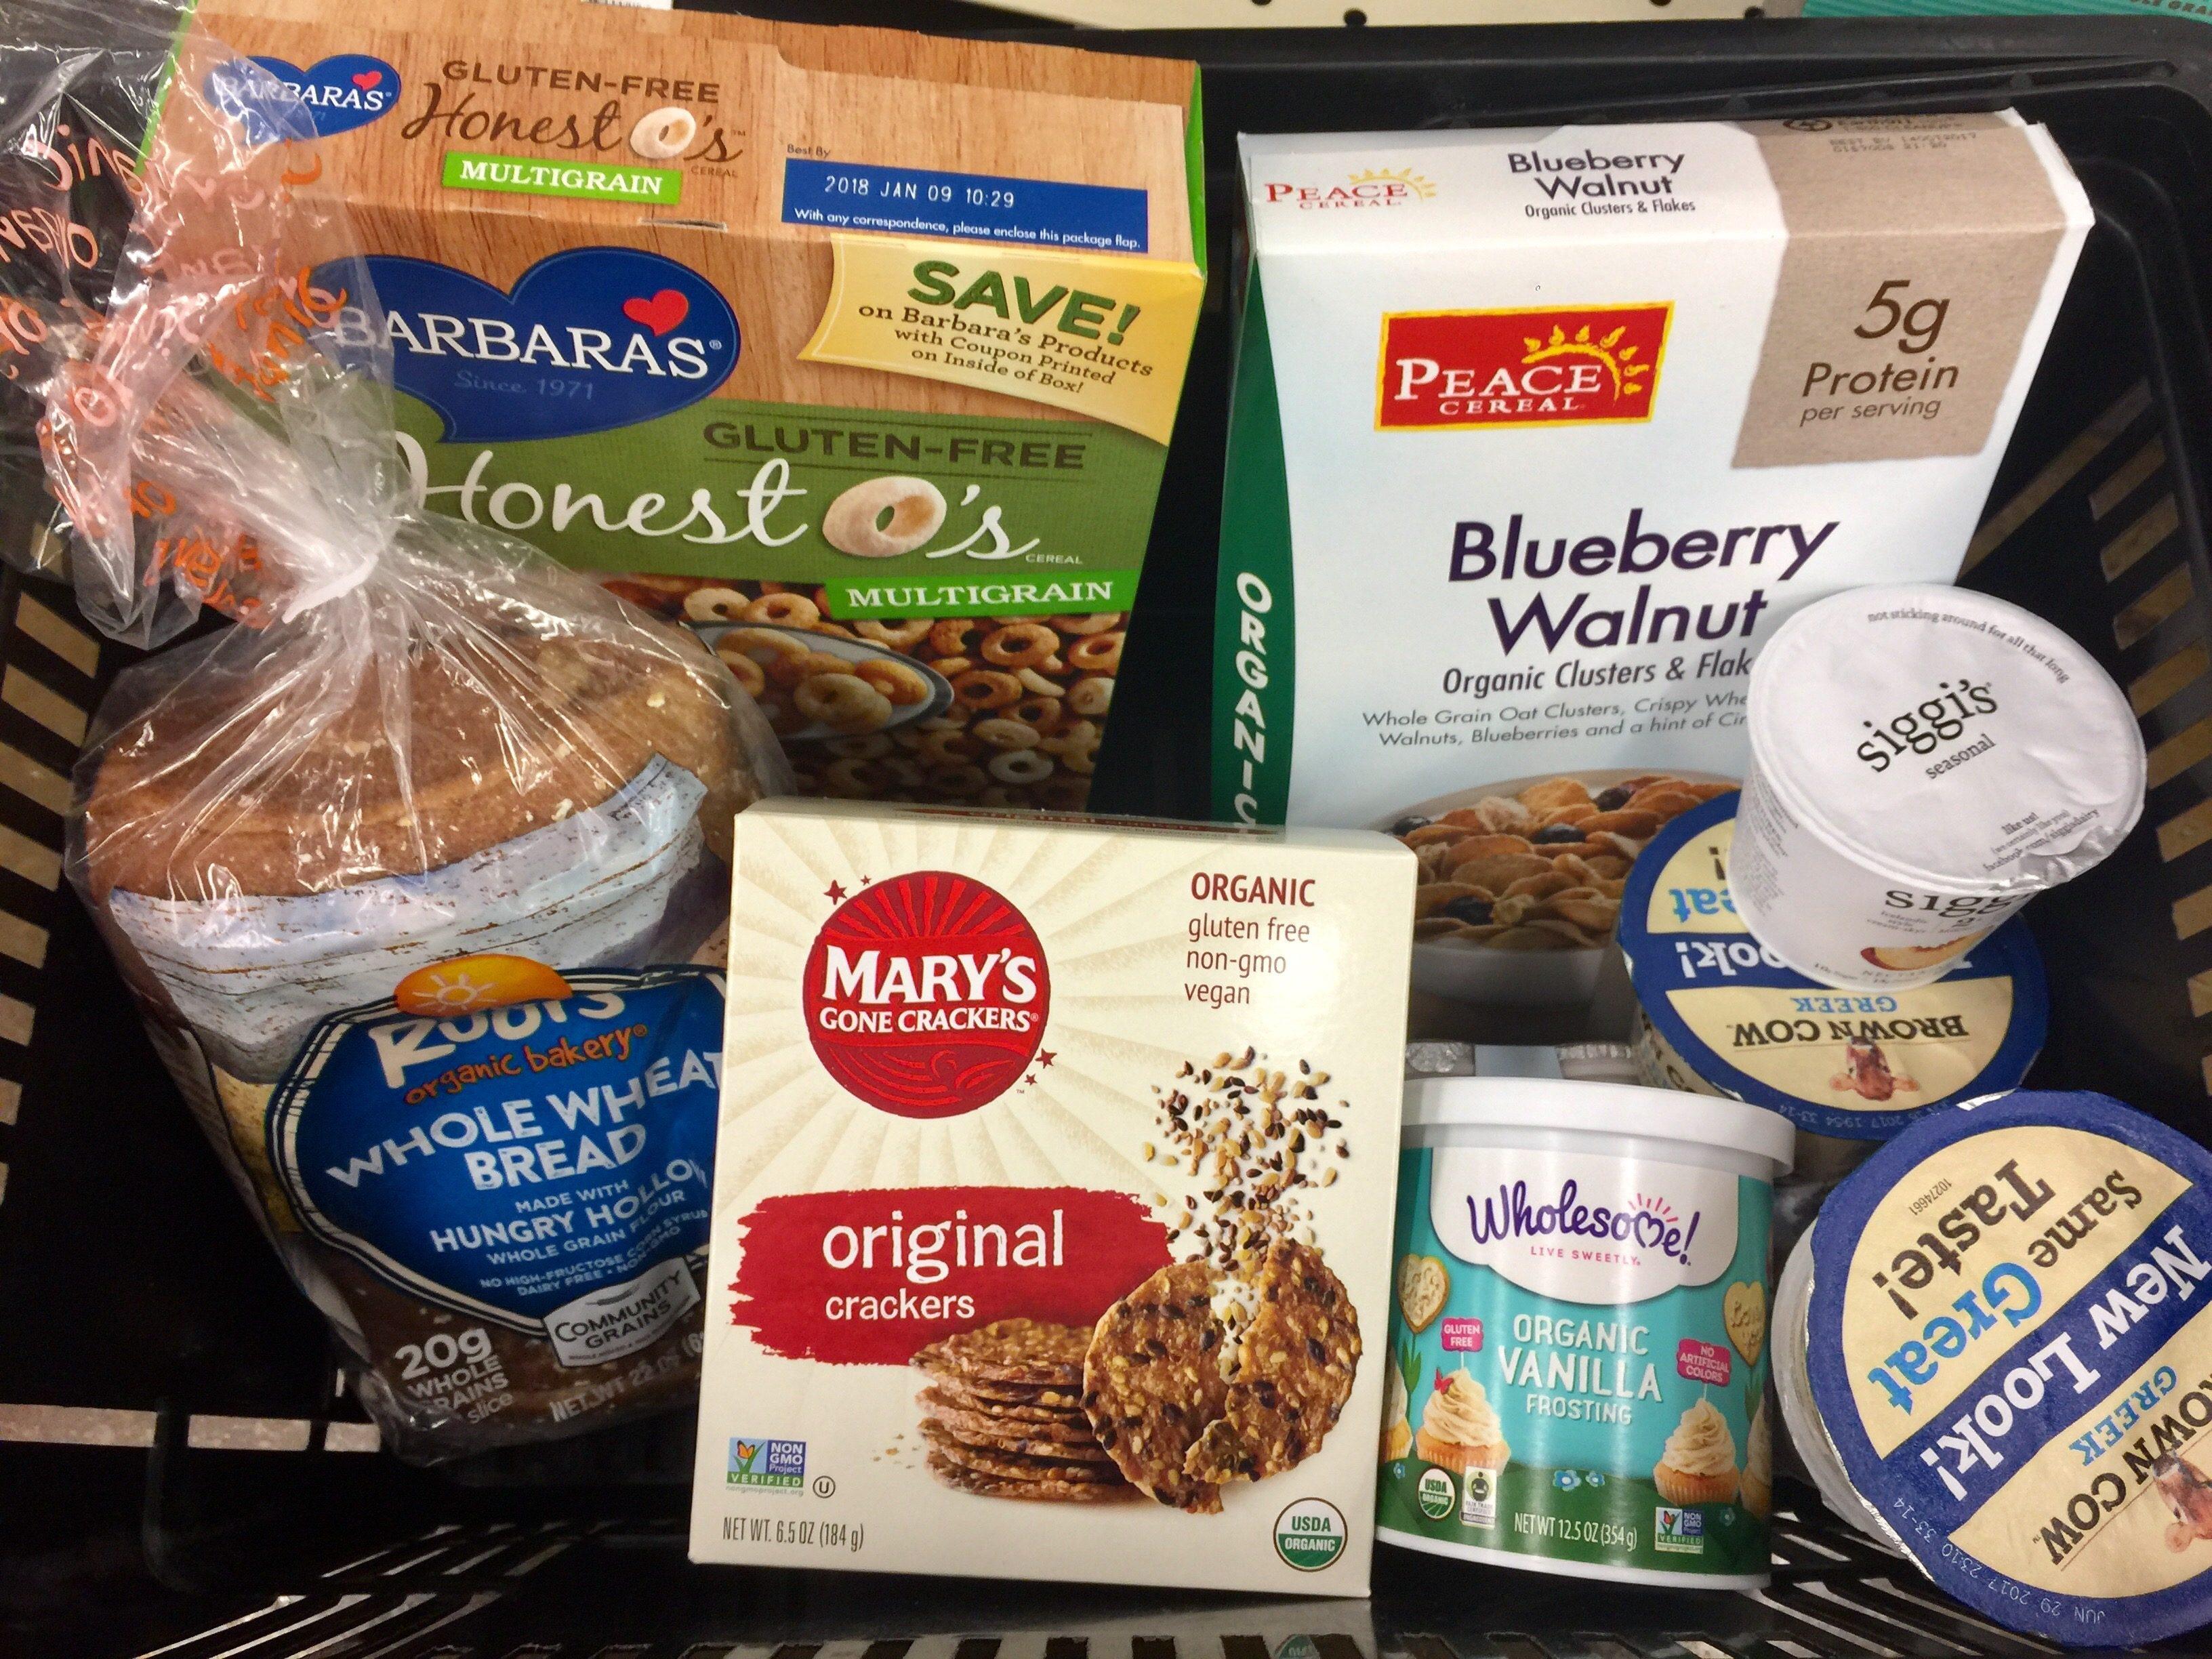 money-saving hacks at Whole Foods Market – basket of food items